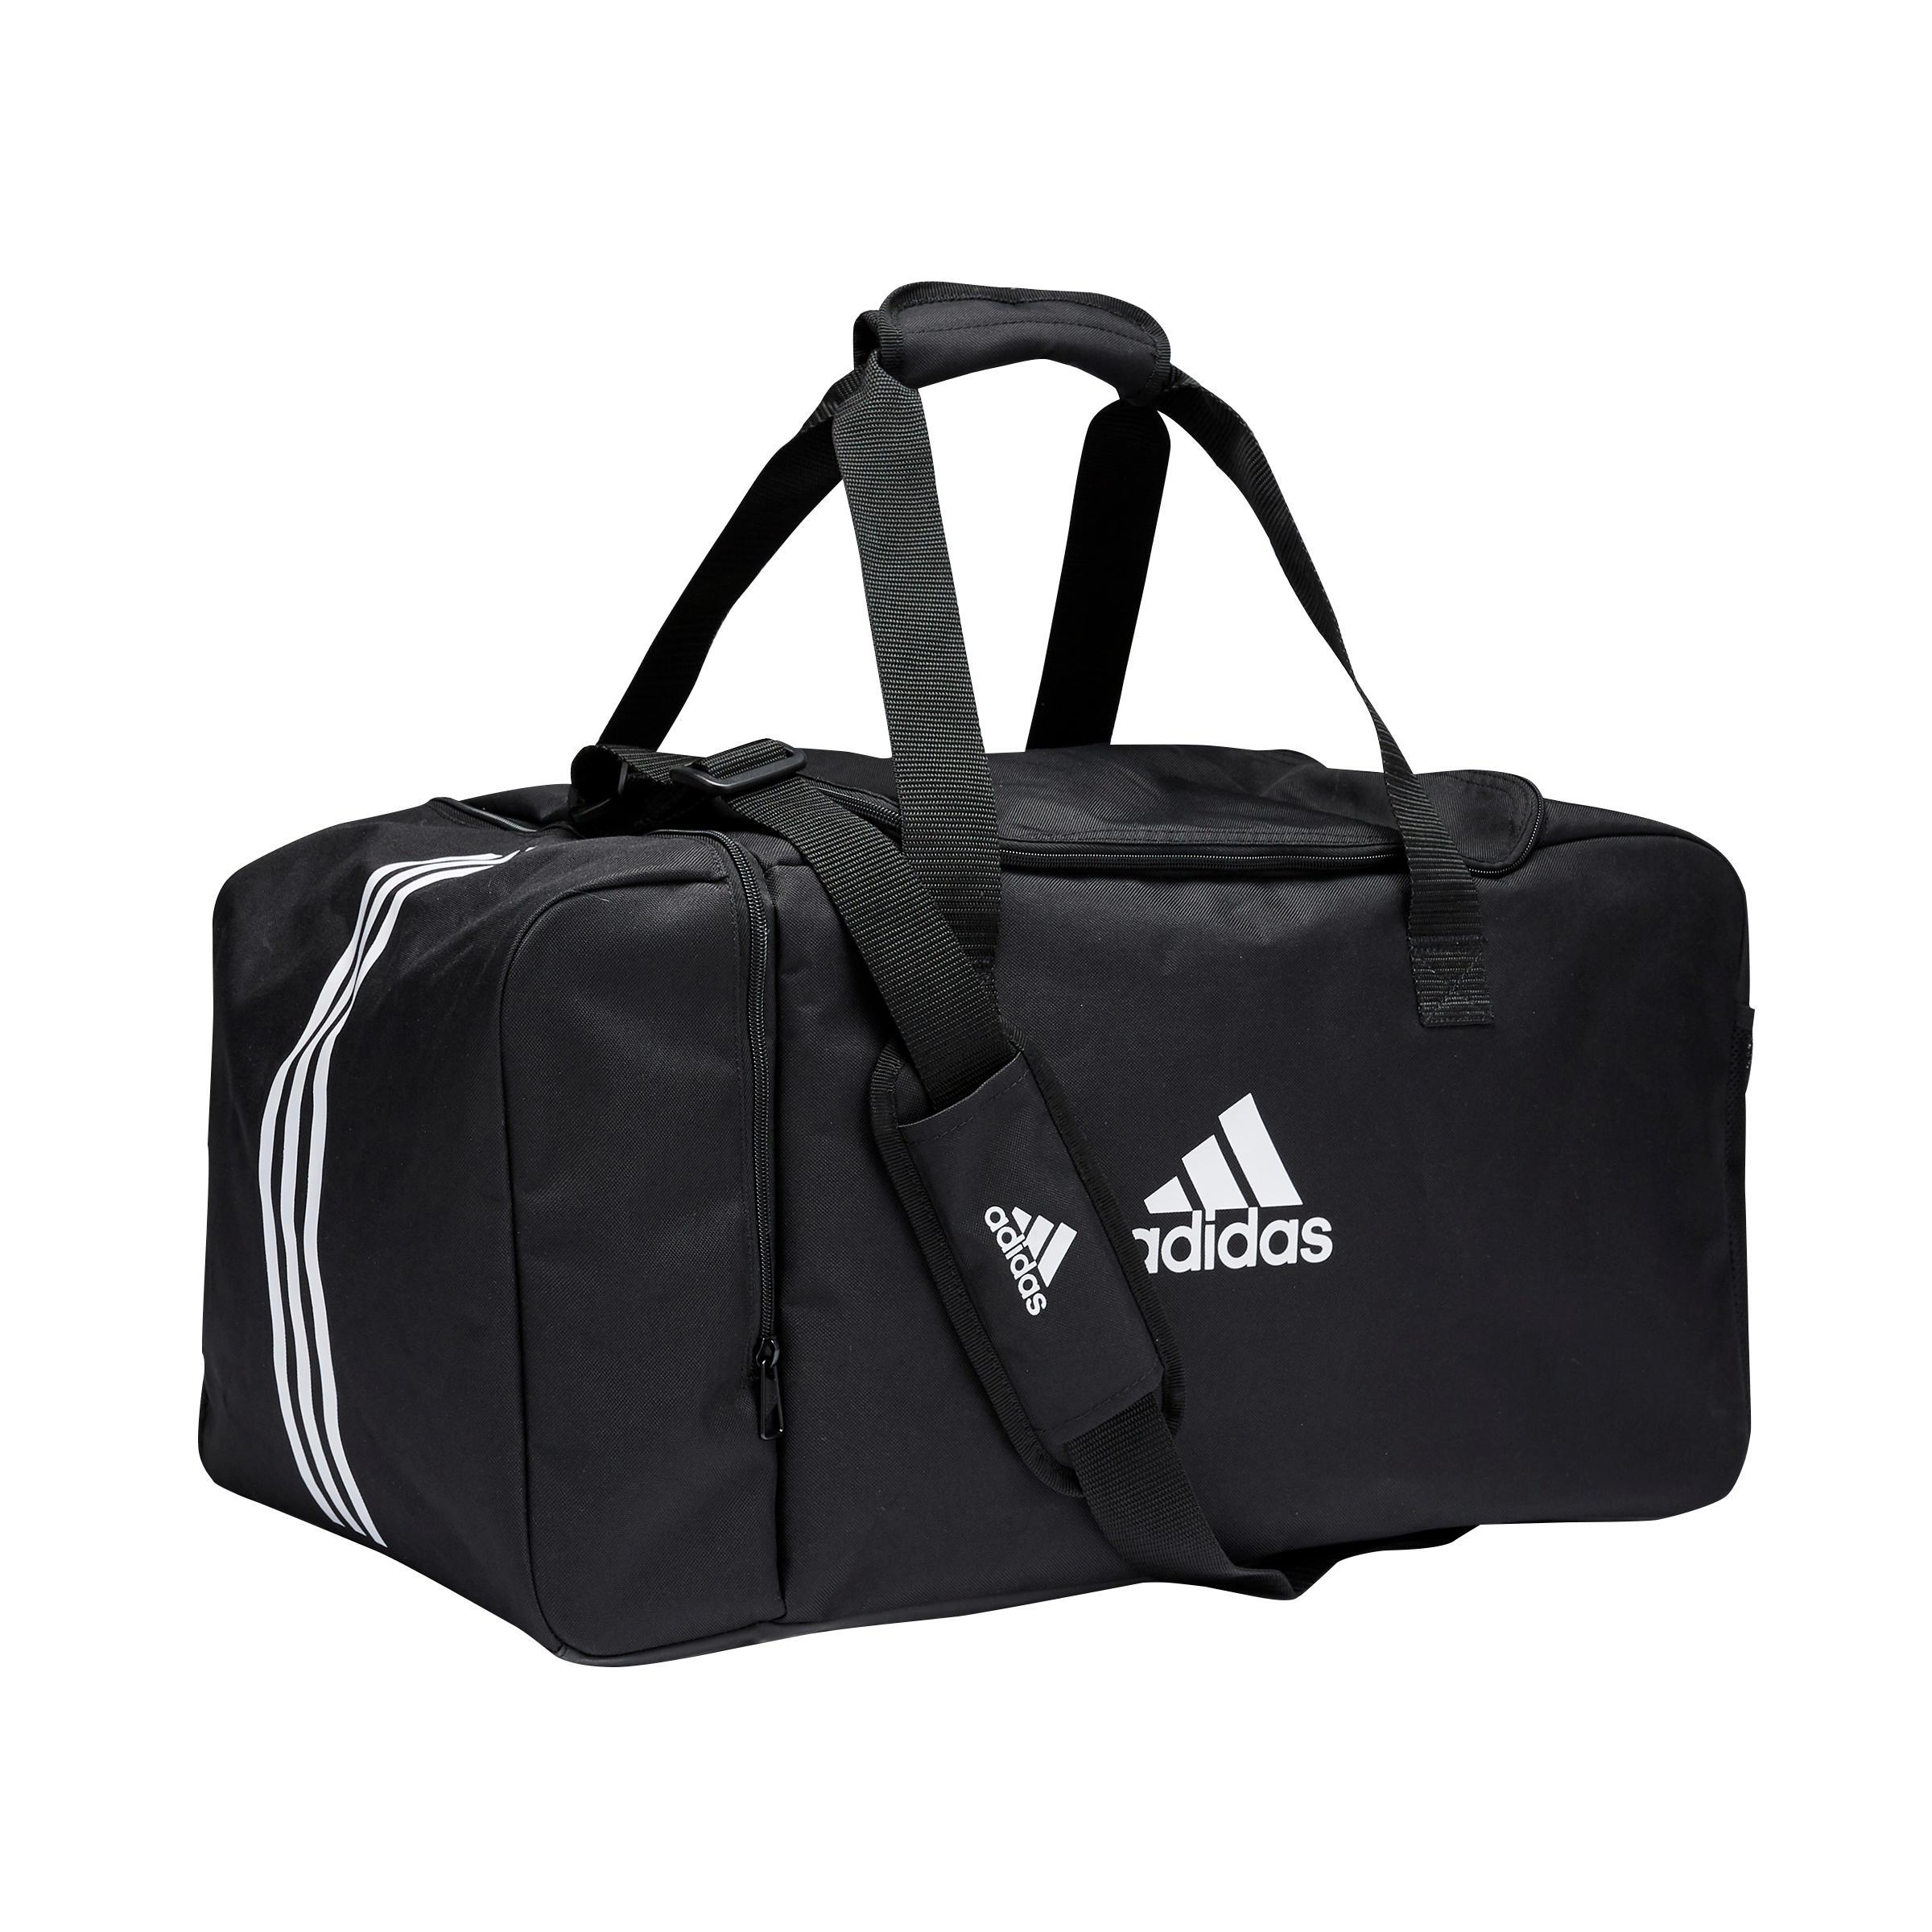 detailed look high quality no sale tax Sacs de sport | Decathlon